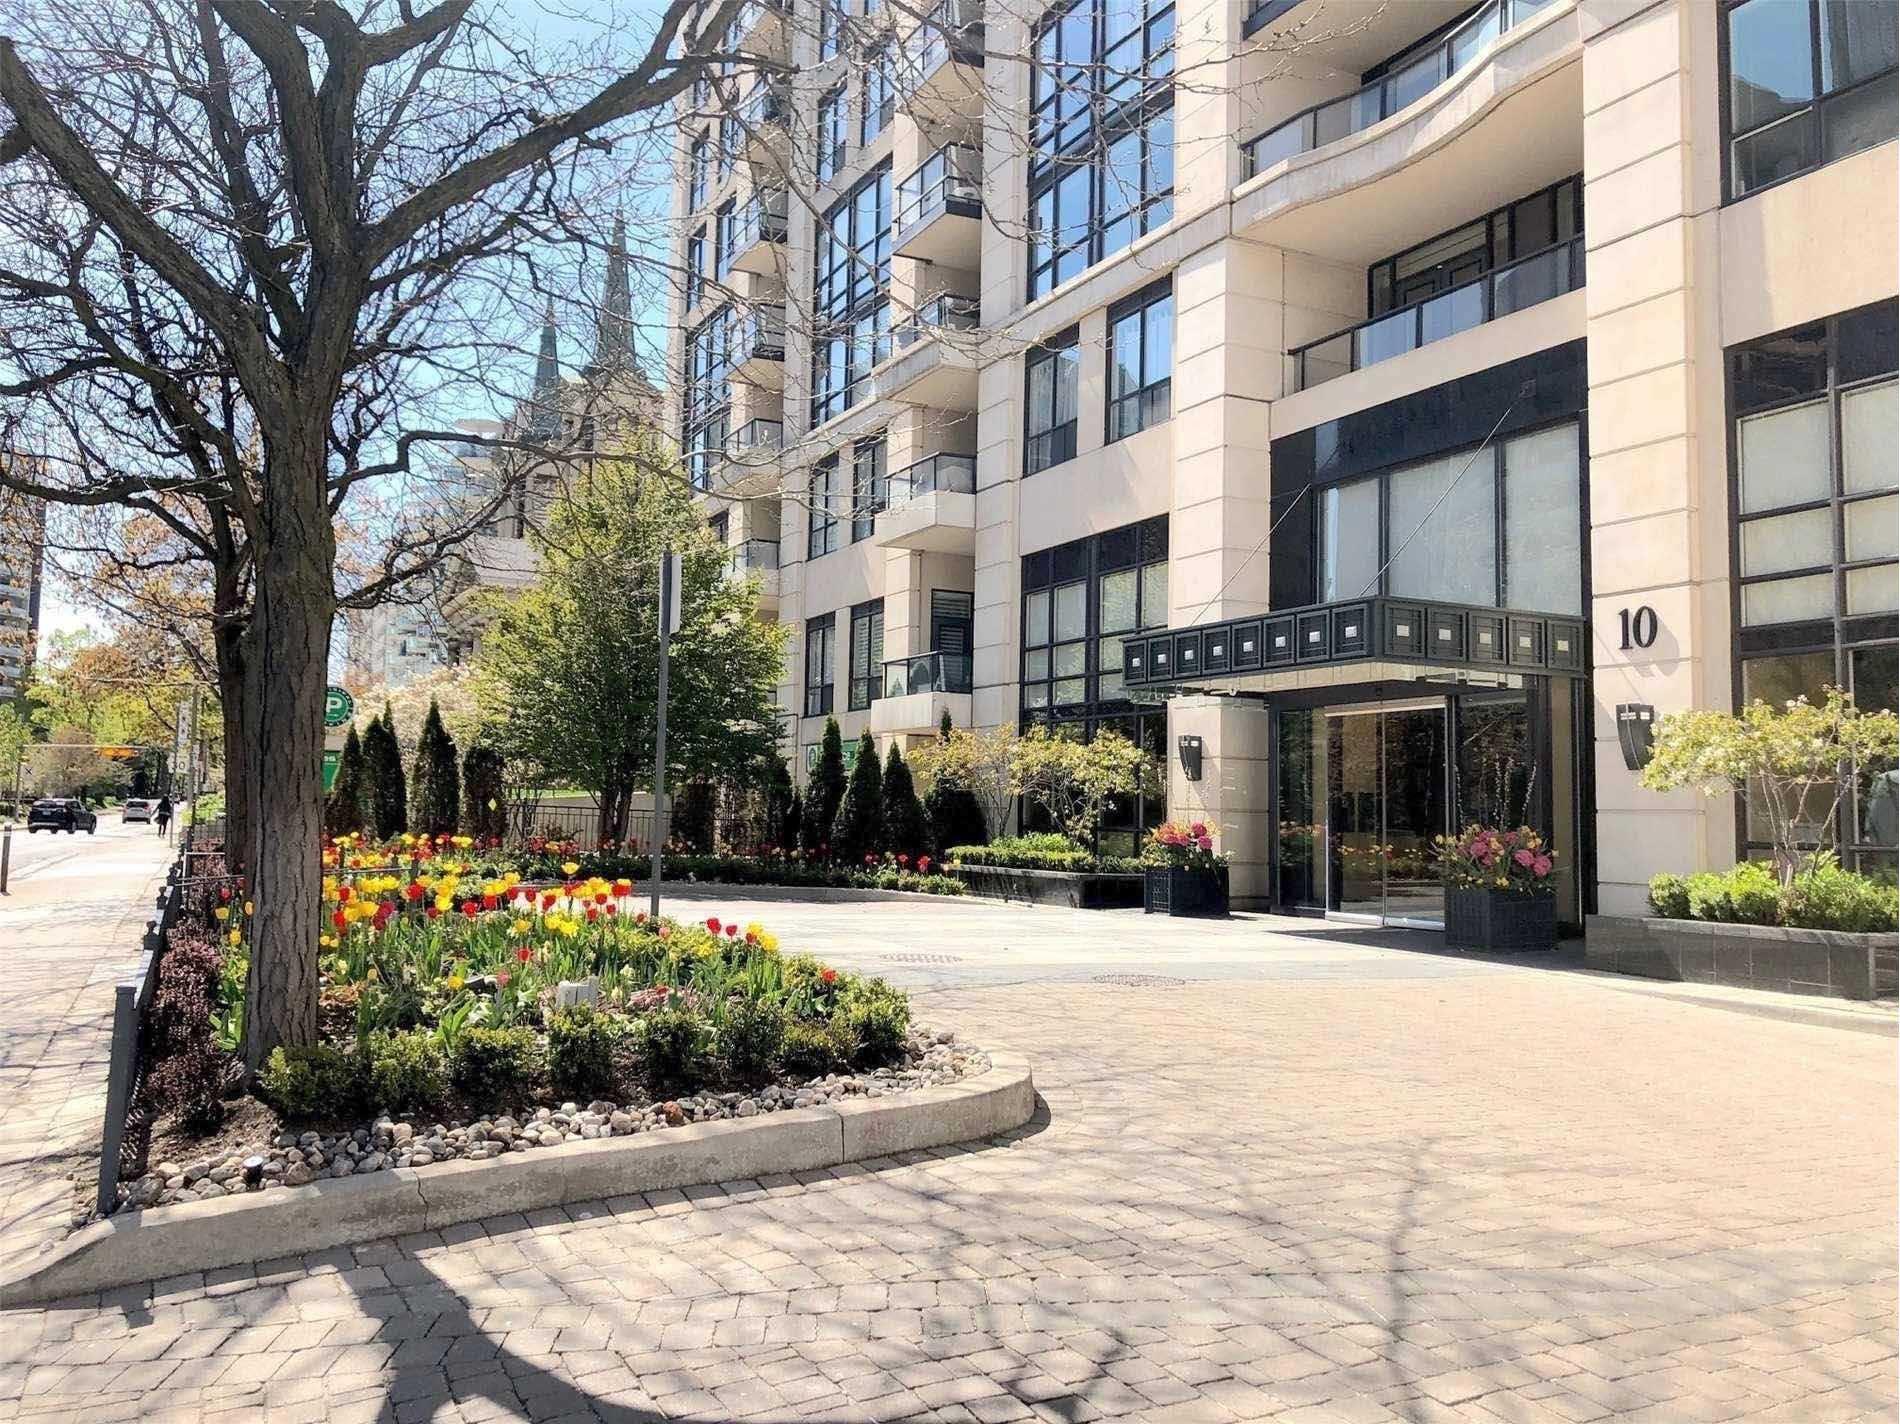 Main Photo: 212 10 Delisle Avenue in Toronto: Yonge-St. Clair Condo for lease (Toronto C02)  : MLS®# C4563007